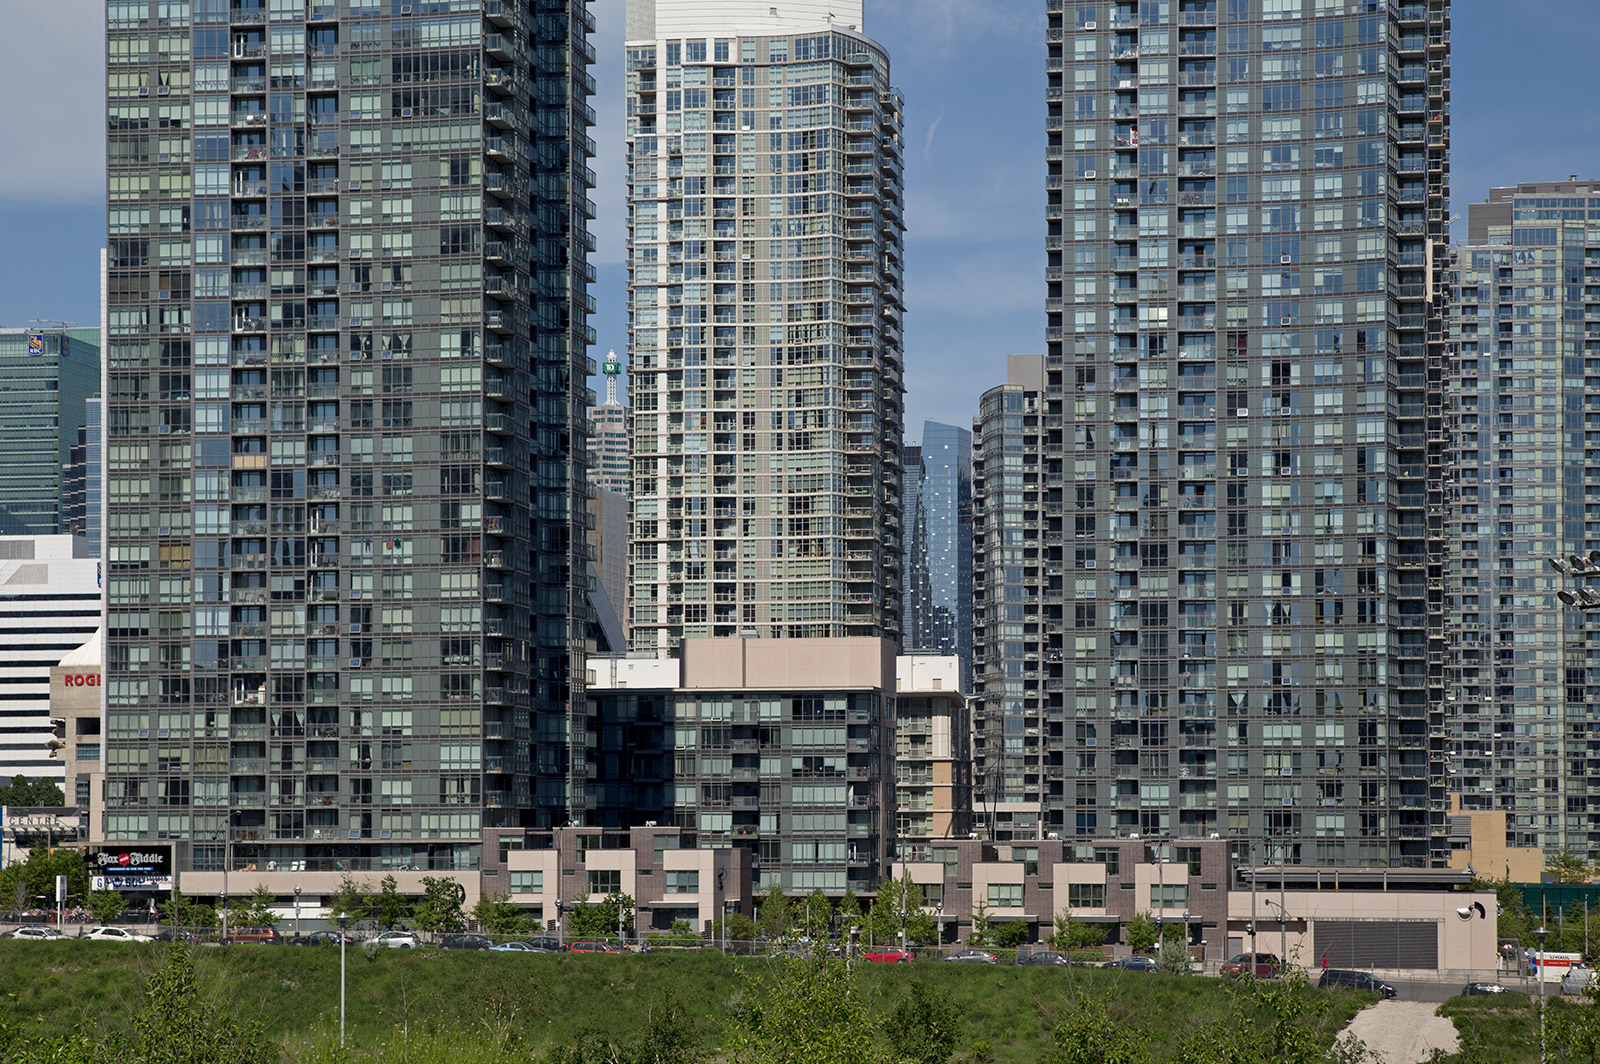 20140601. The CityPlace sea of condominiums in Toronto.